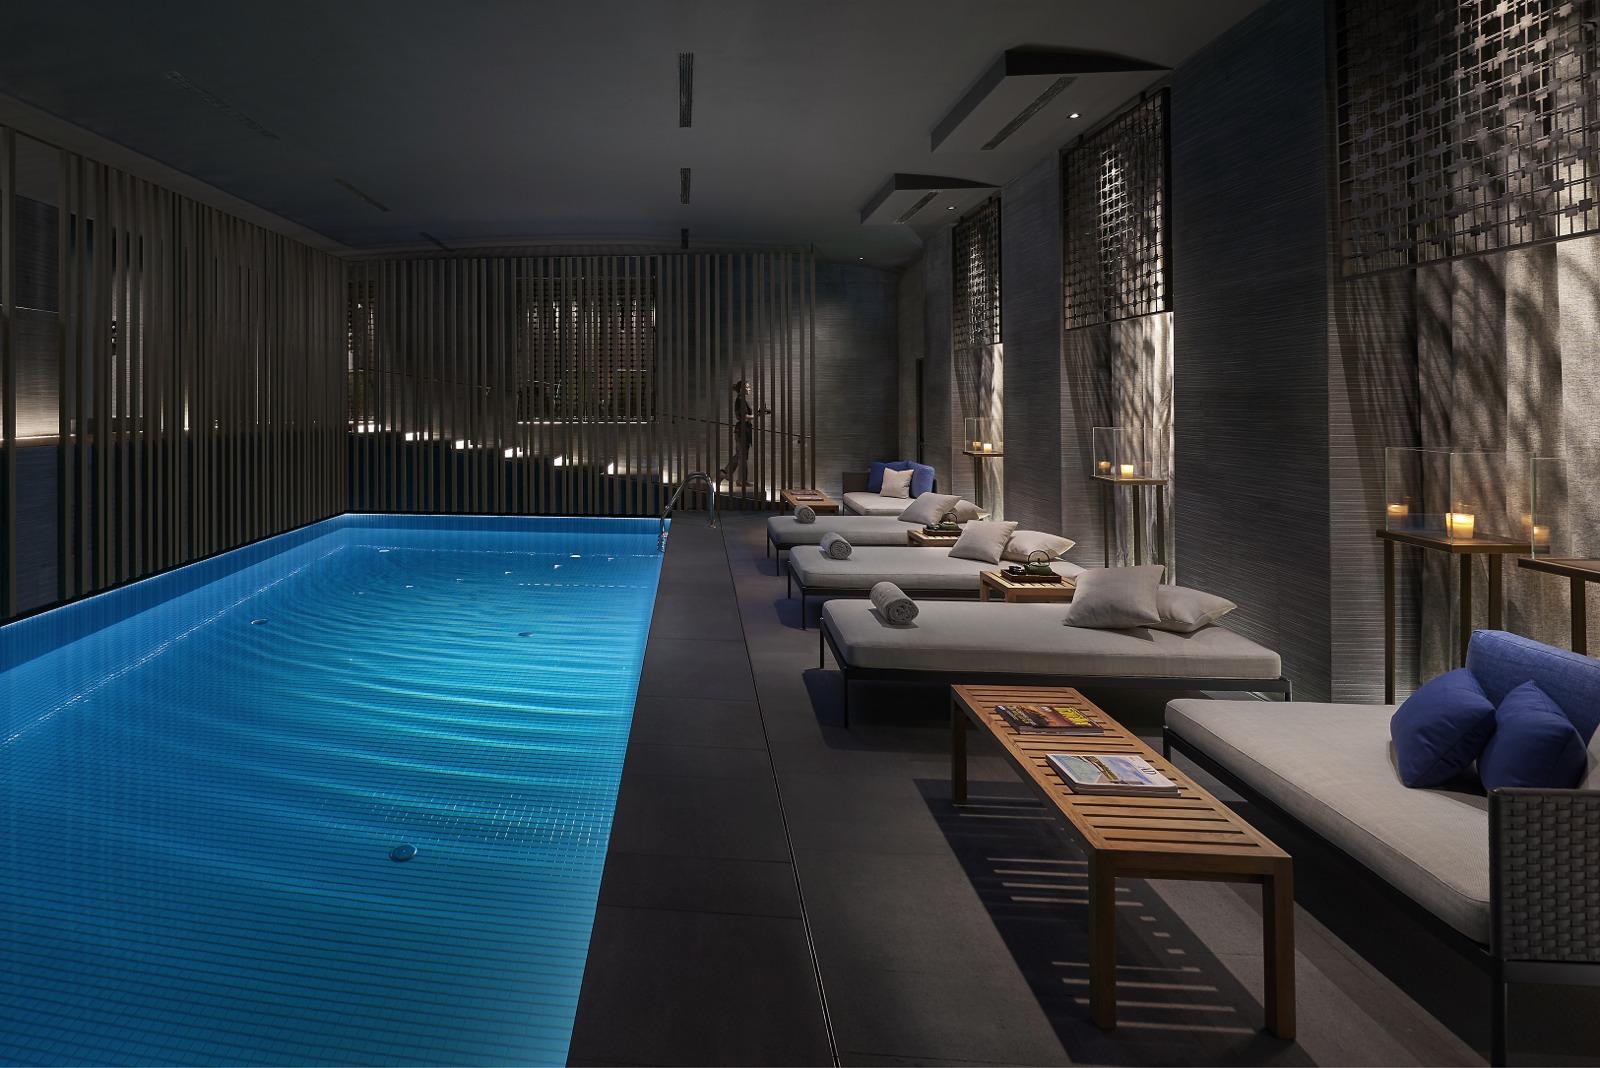 Mandarin oriental milan review gtspirit for Hotel spa 13